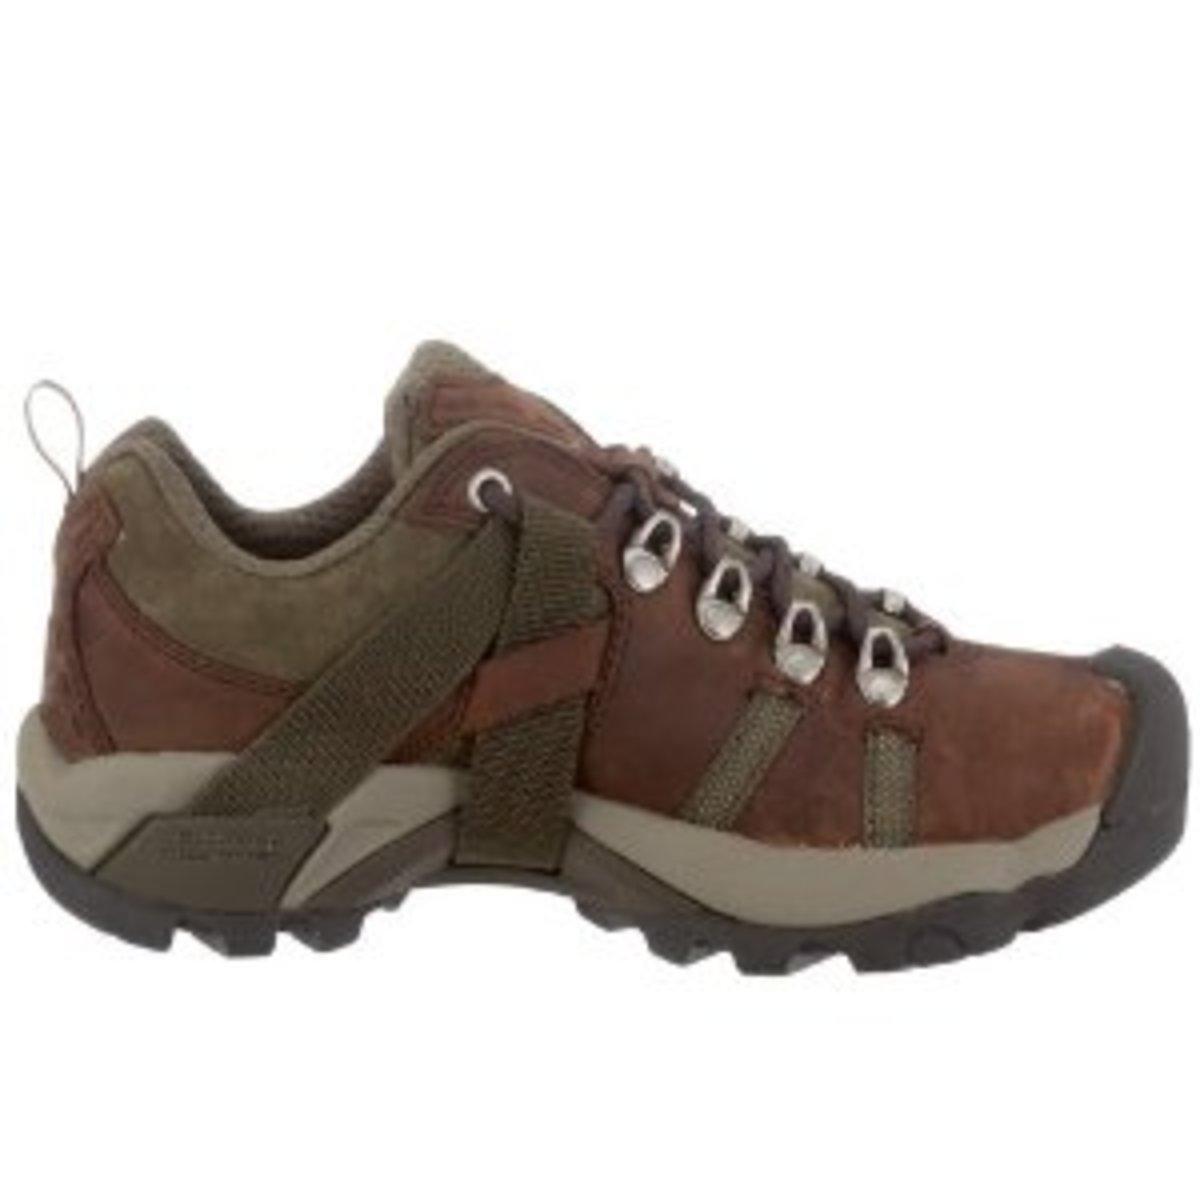 Teva Women's Ossagon Event Hiking Shoe